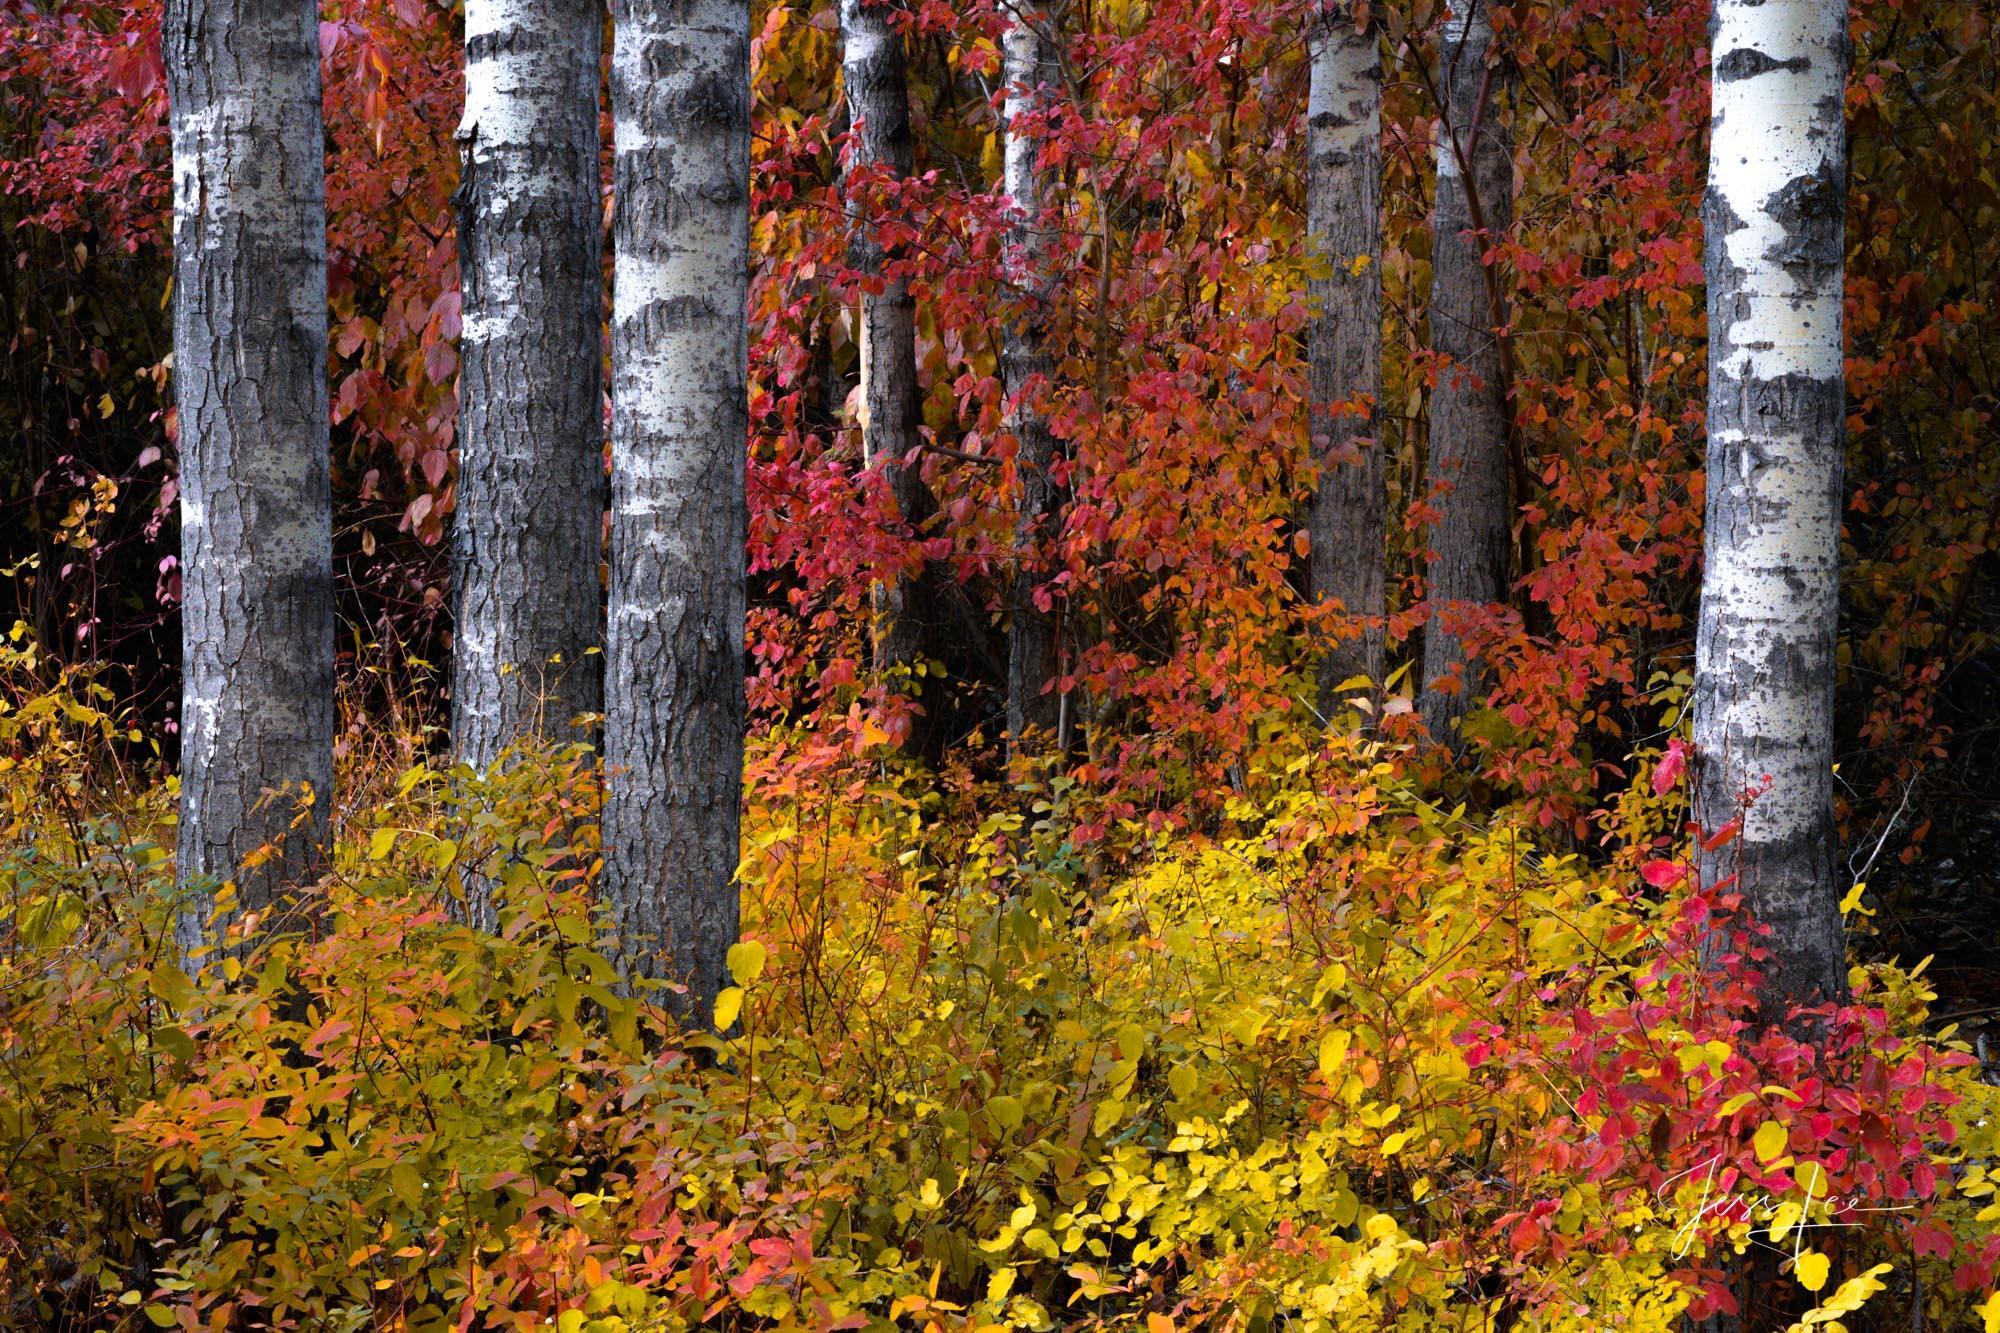 Fine Art Limited Edition Photography of Washington. Autumn Tree Cluster, Washington Autumn Landscapes, Rivers, waterways.This...